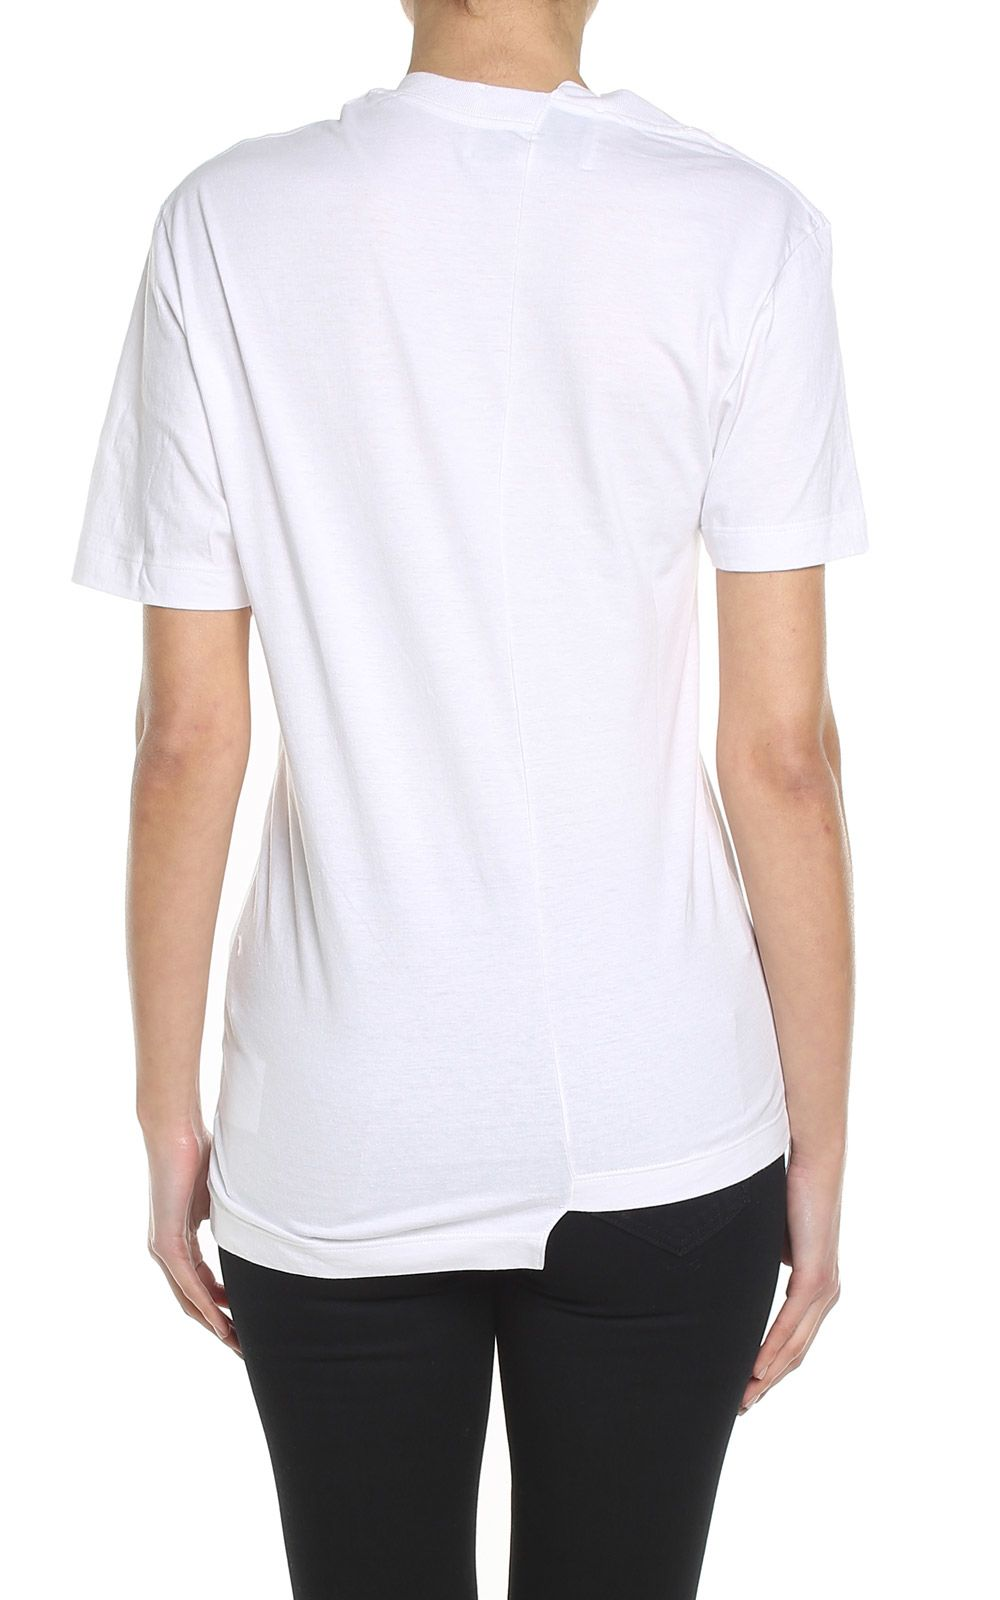 Footlocker Finishline Online Asymmetric cotton-jersey t-shirt Fruit of the Loom x Cedric Charlier Cedric Charlier 2018 New Online Factory Outlet Cheap Price tnzCphx3